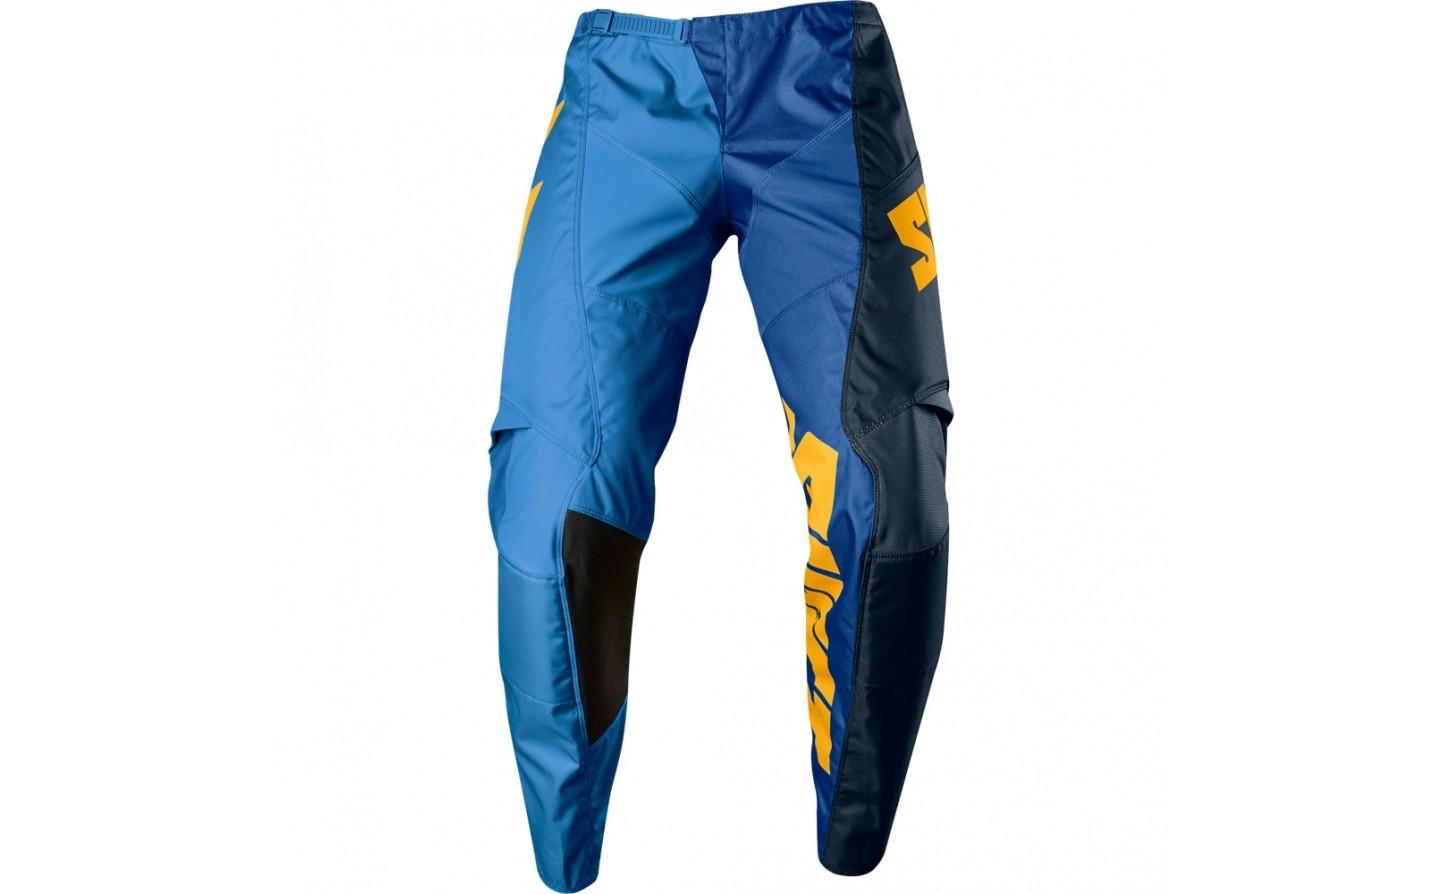 pantalon shift label whit3 tarmac azul talle 38